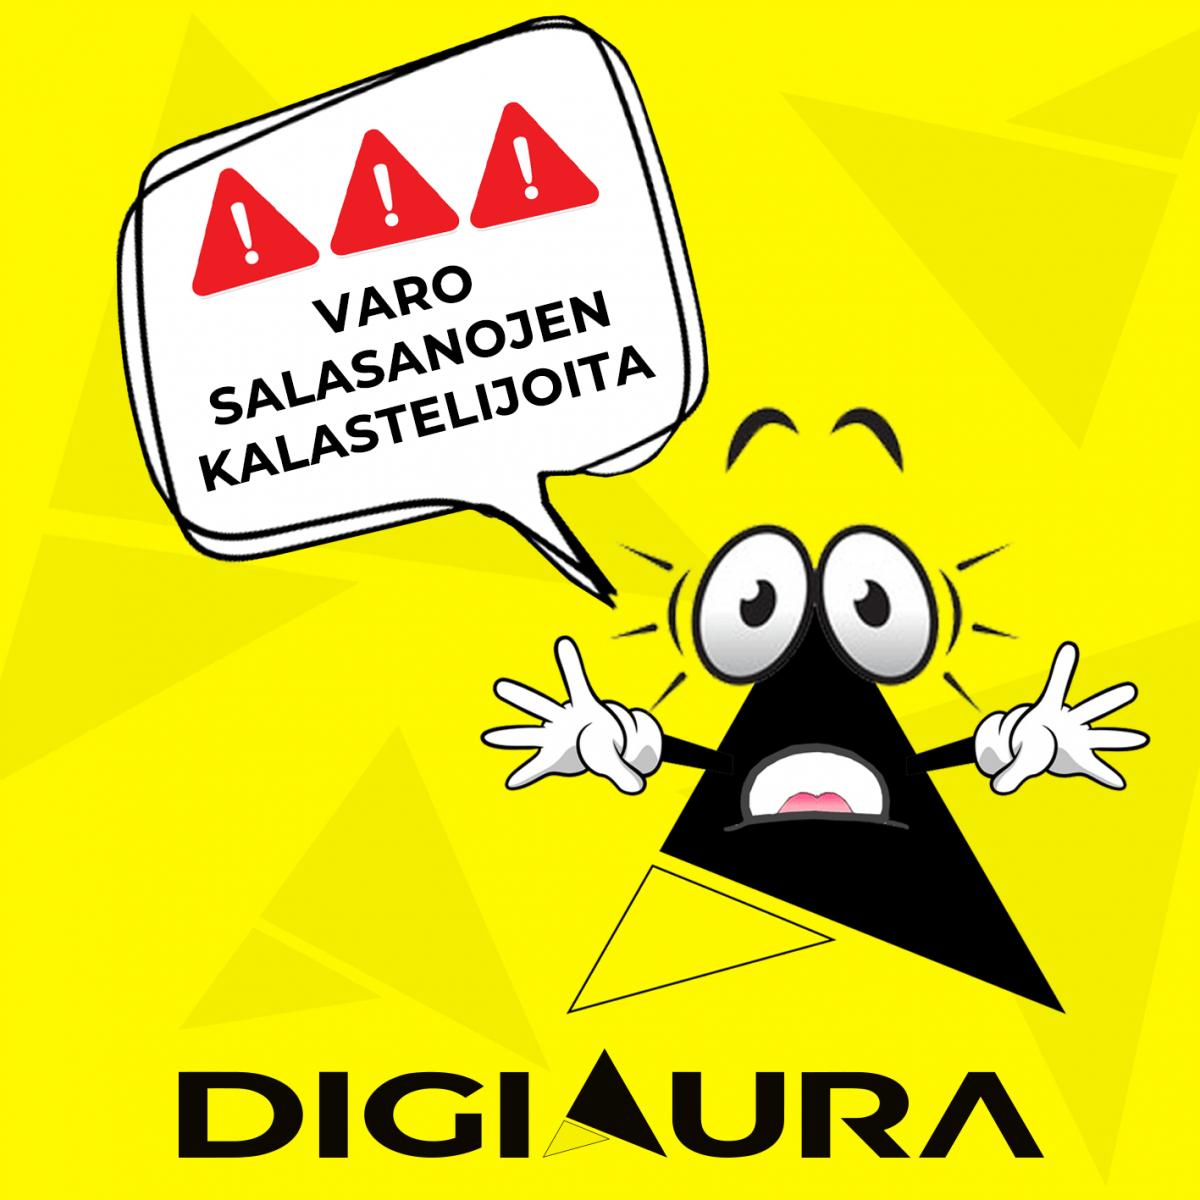 Varo huijausviestejä, pysy valppaana! | DigiAura.fi